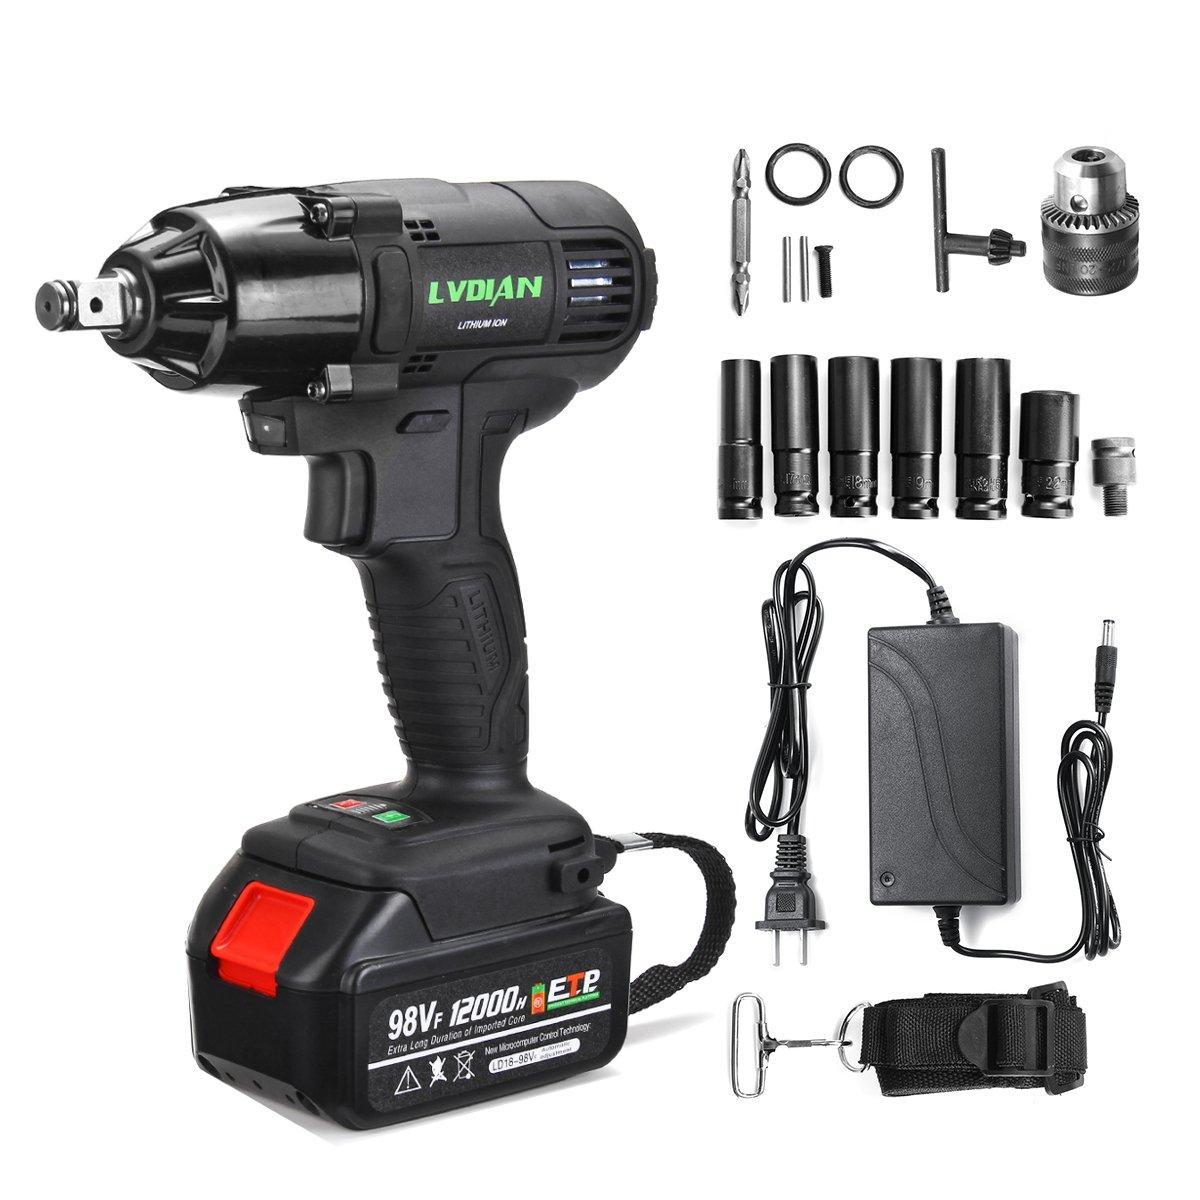 98VF 12000mAh 320NM Electric Cordless Impact Wrench Drill Screwdriver Set Power Repair Tools Kit